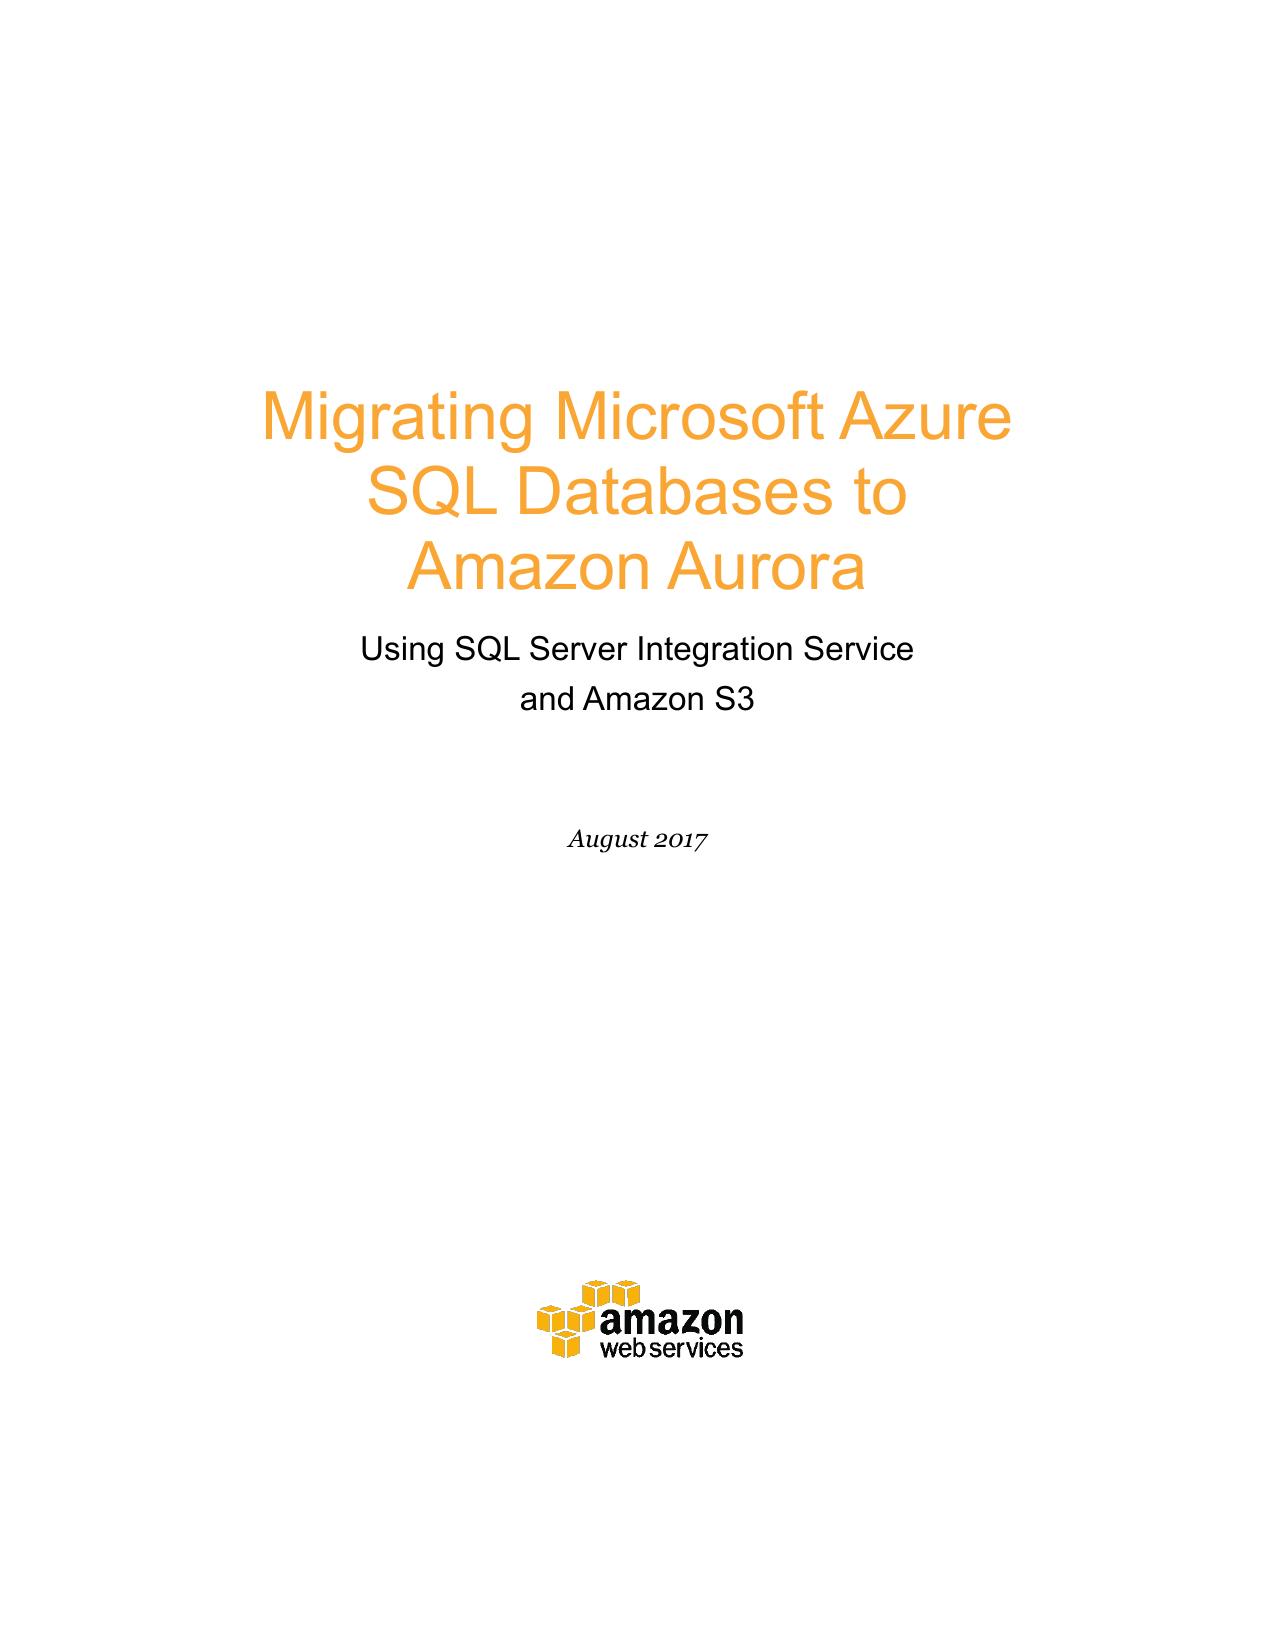 Migrating Microsoft Azure SQL Databases to Amazon Aurora